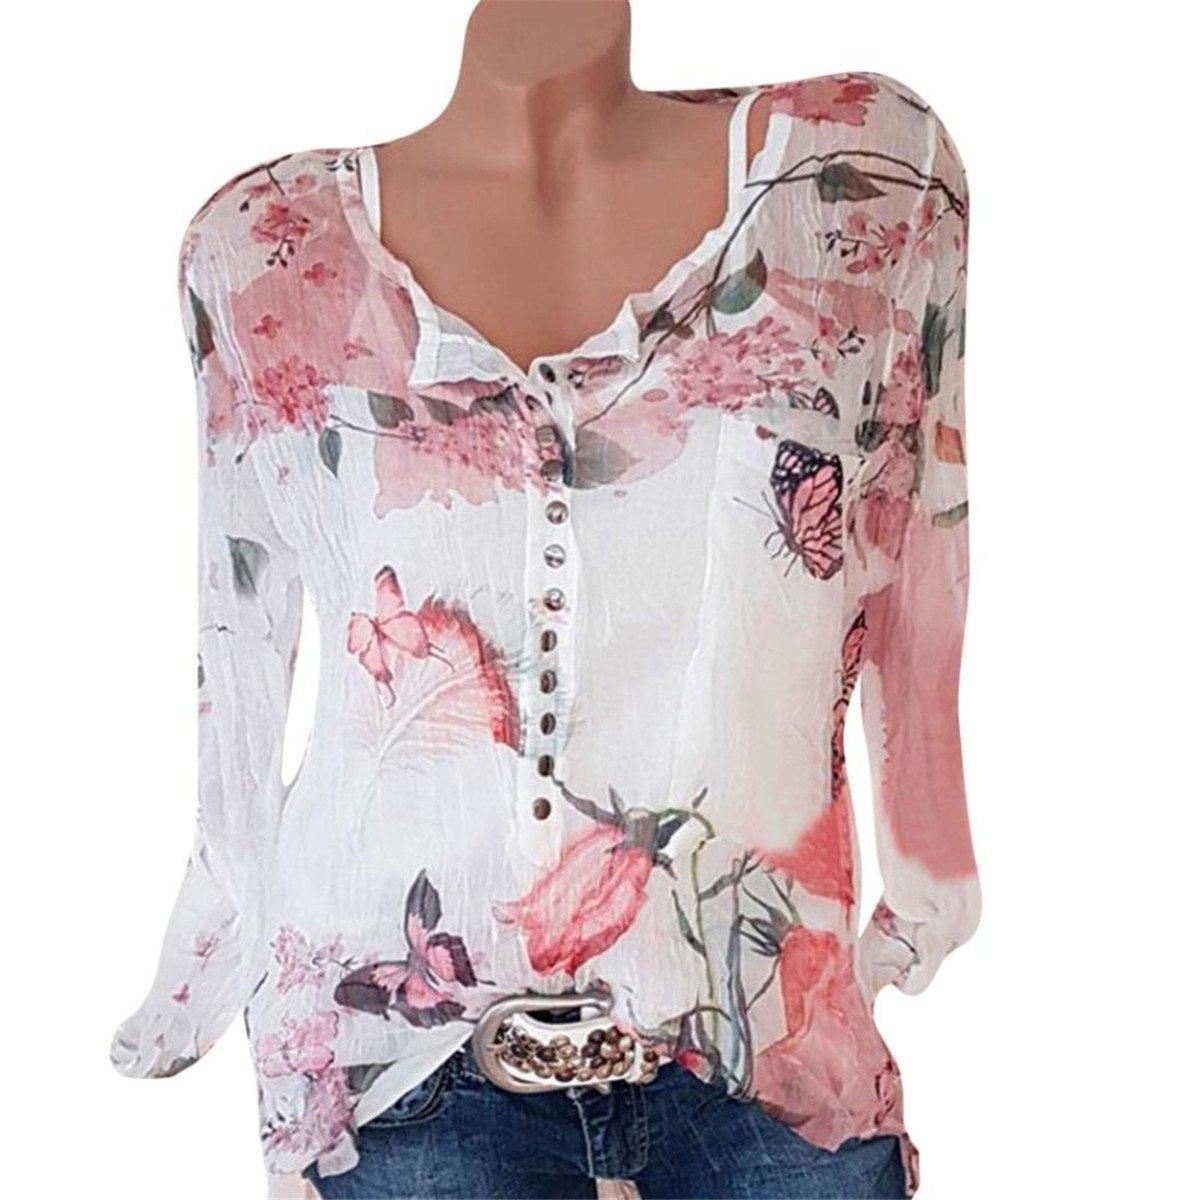 HongXander Plus Size Women Casual Floral Printed Beach Blouse Button T-Shirt Chiffon Irregular Hem Top by HongXander-Shirts (Image #1)